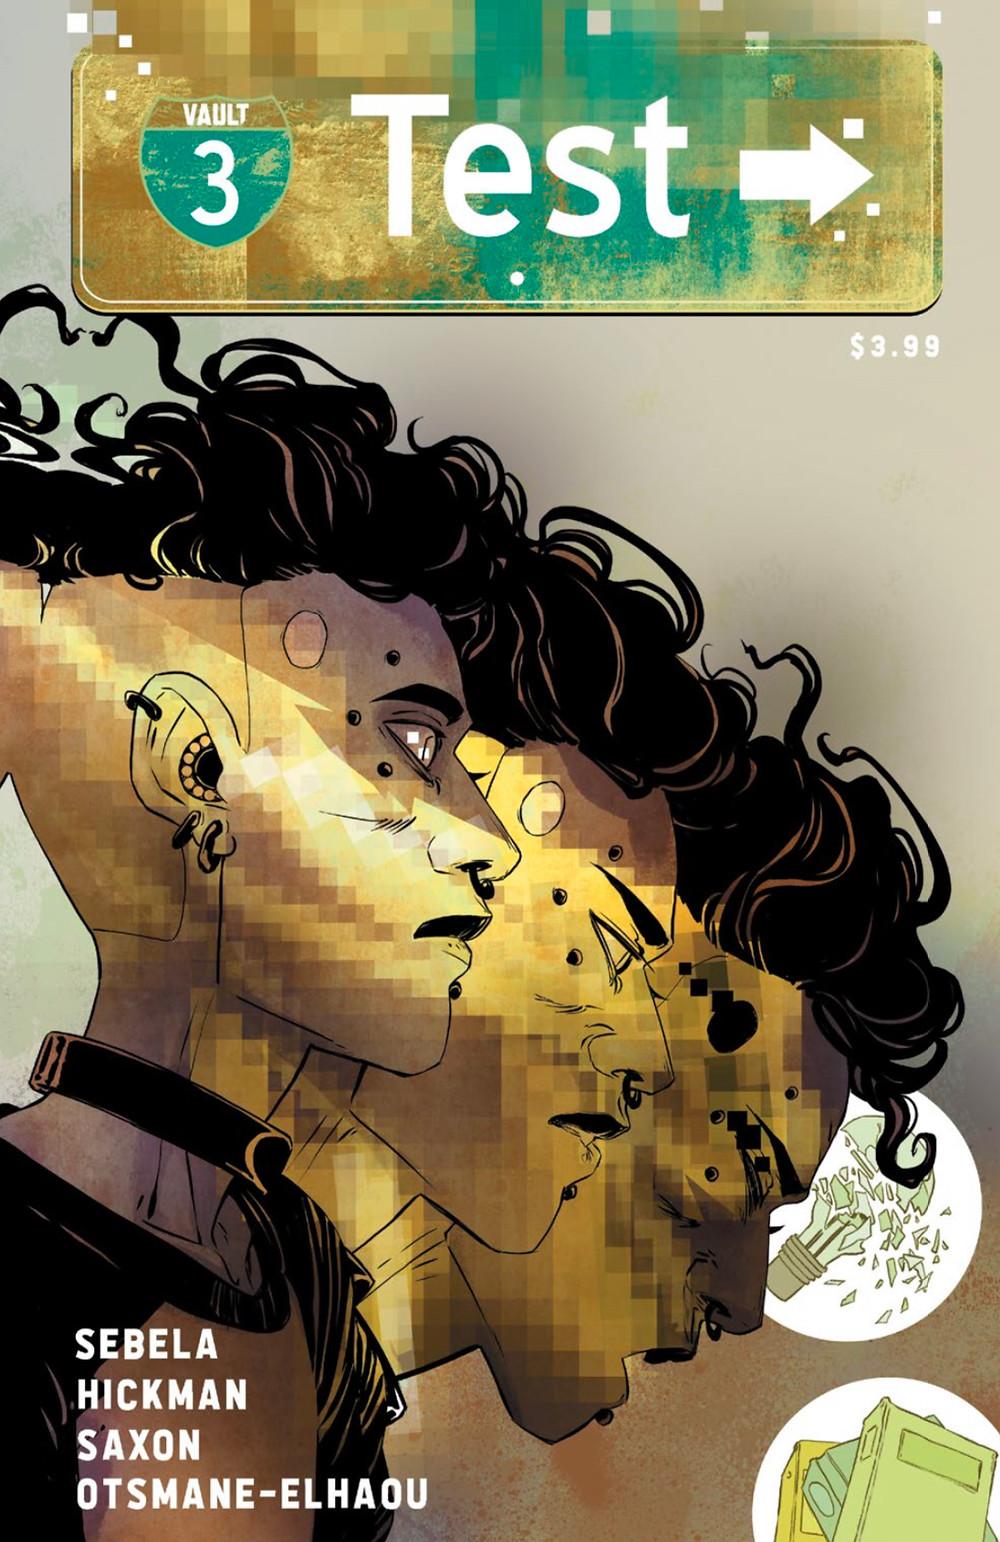 Test, issue #3, cover, Vault Comics, Sebela/Hickman